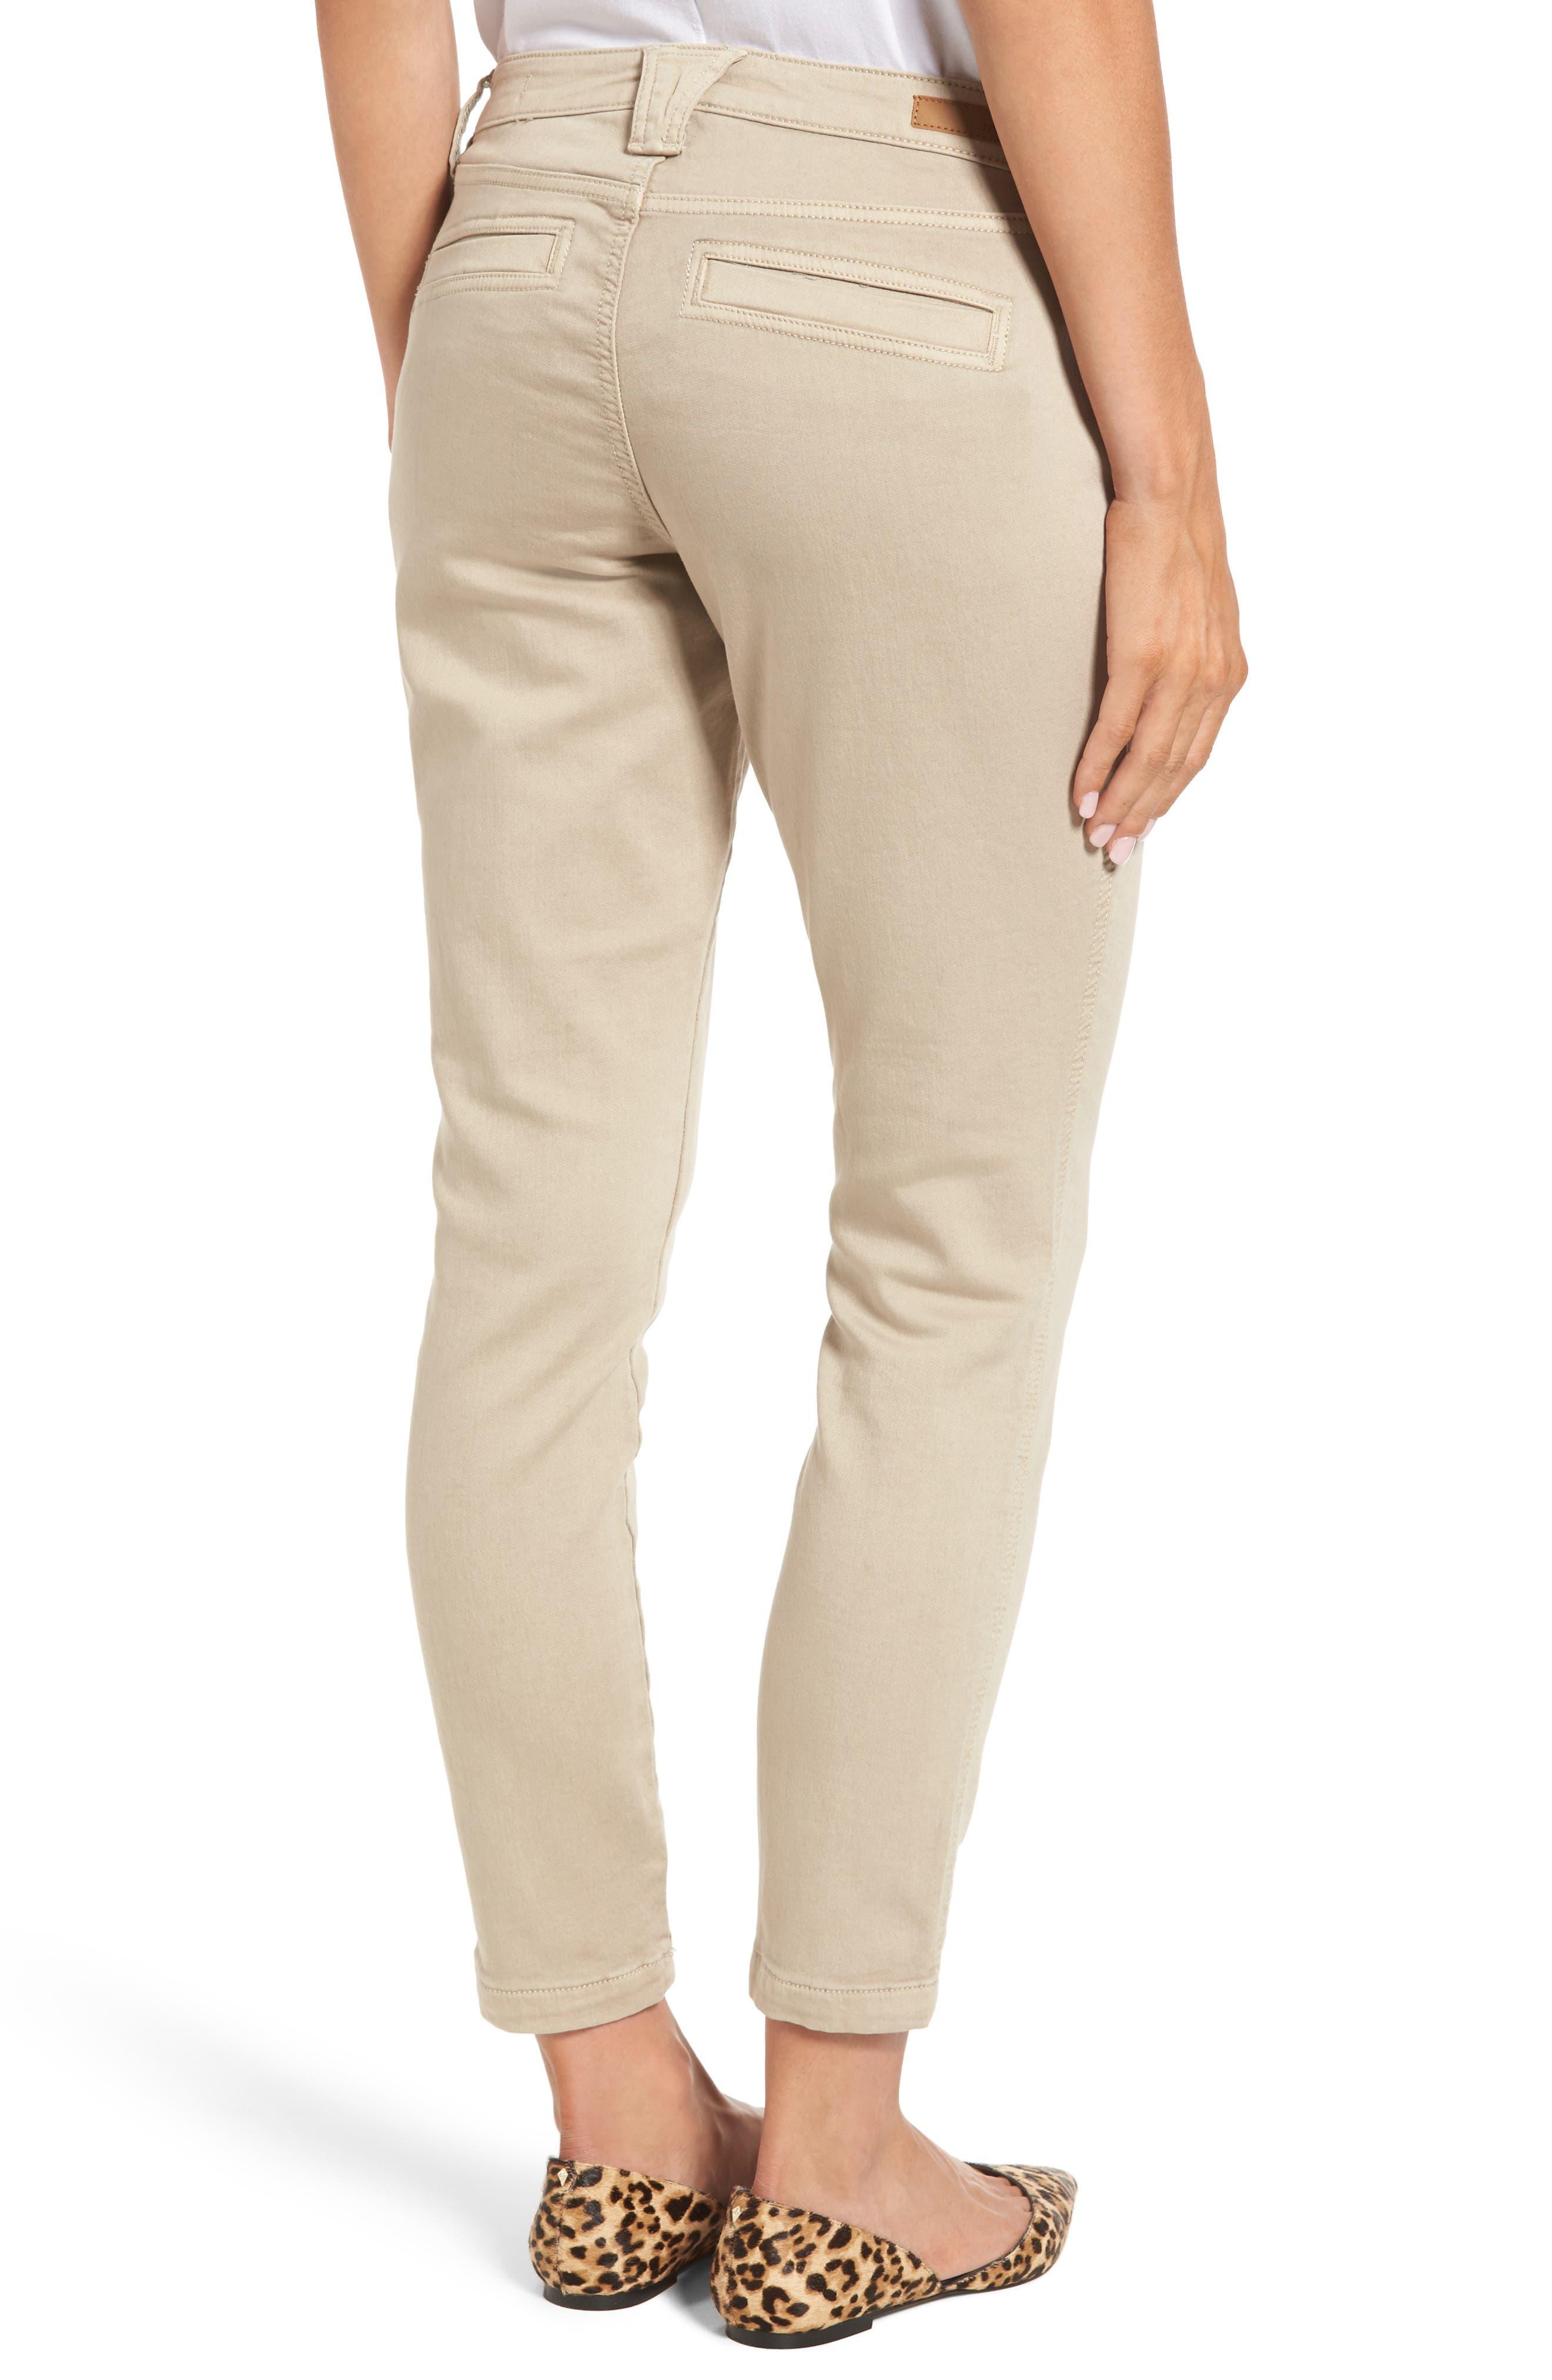 Ryan Knit Skinny Jeans,                             Alternate thumbnail 2, color,                             Birchwood